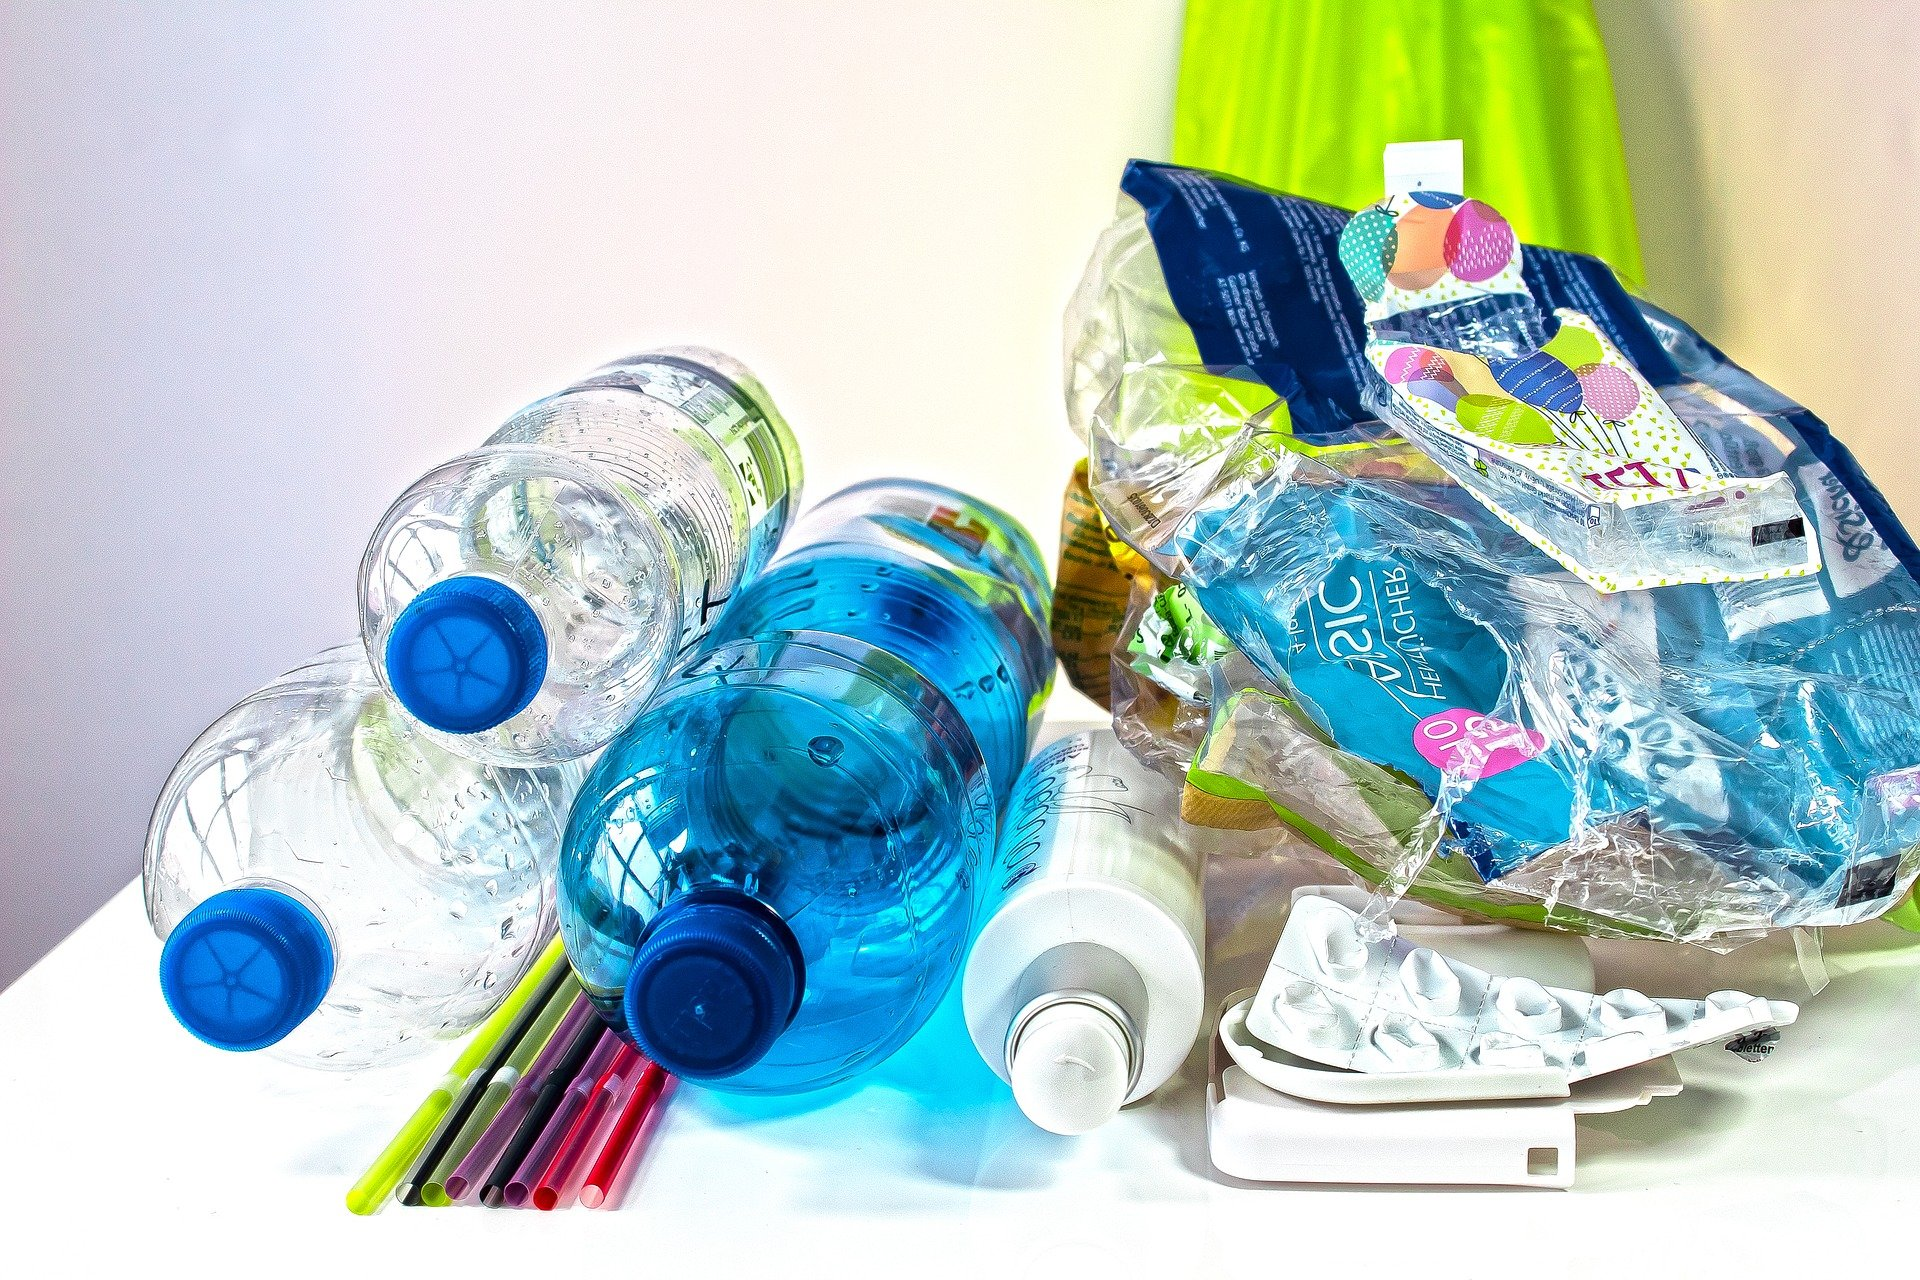 Single use plastic: impact and alternative solution